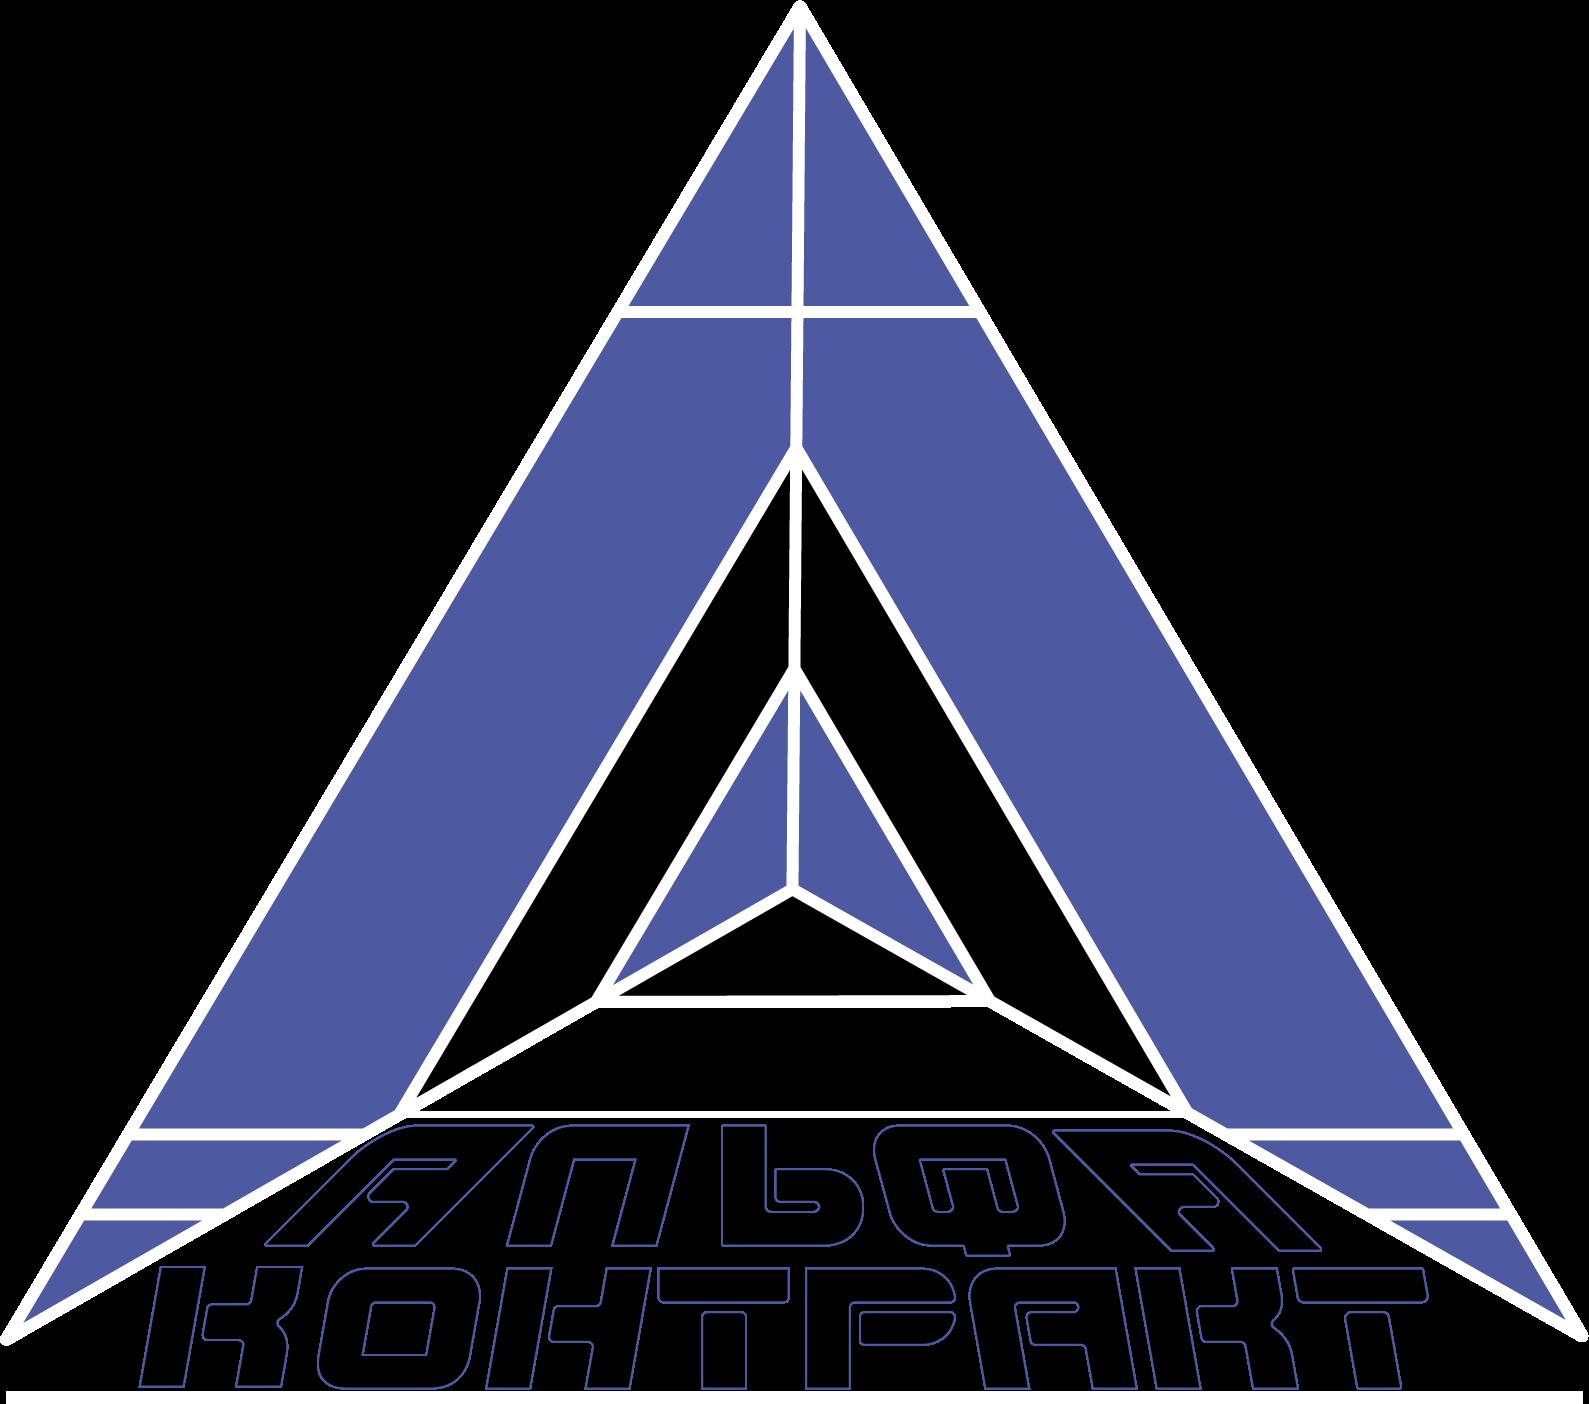 Дизайнер для разработки логотипа компании фото f_6915bfc63d5b29cc.png